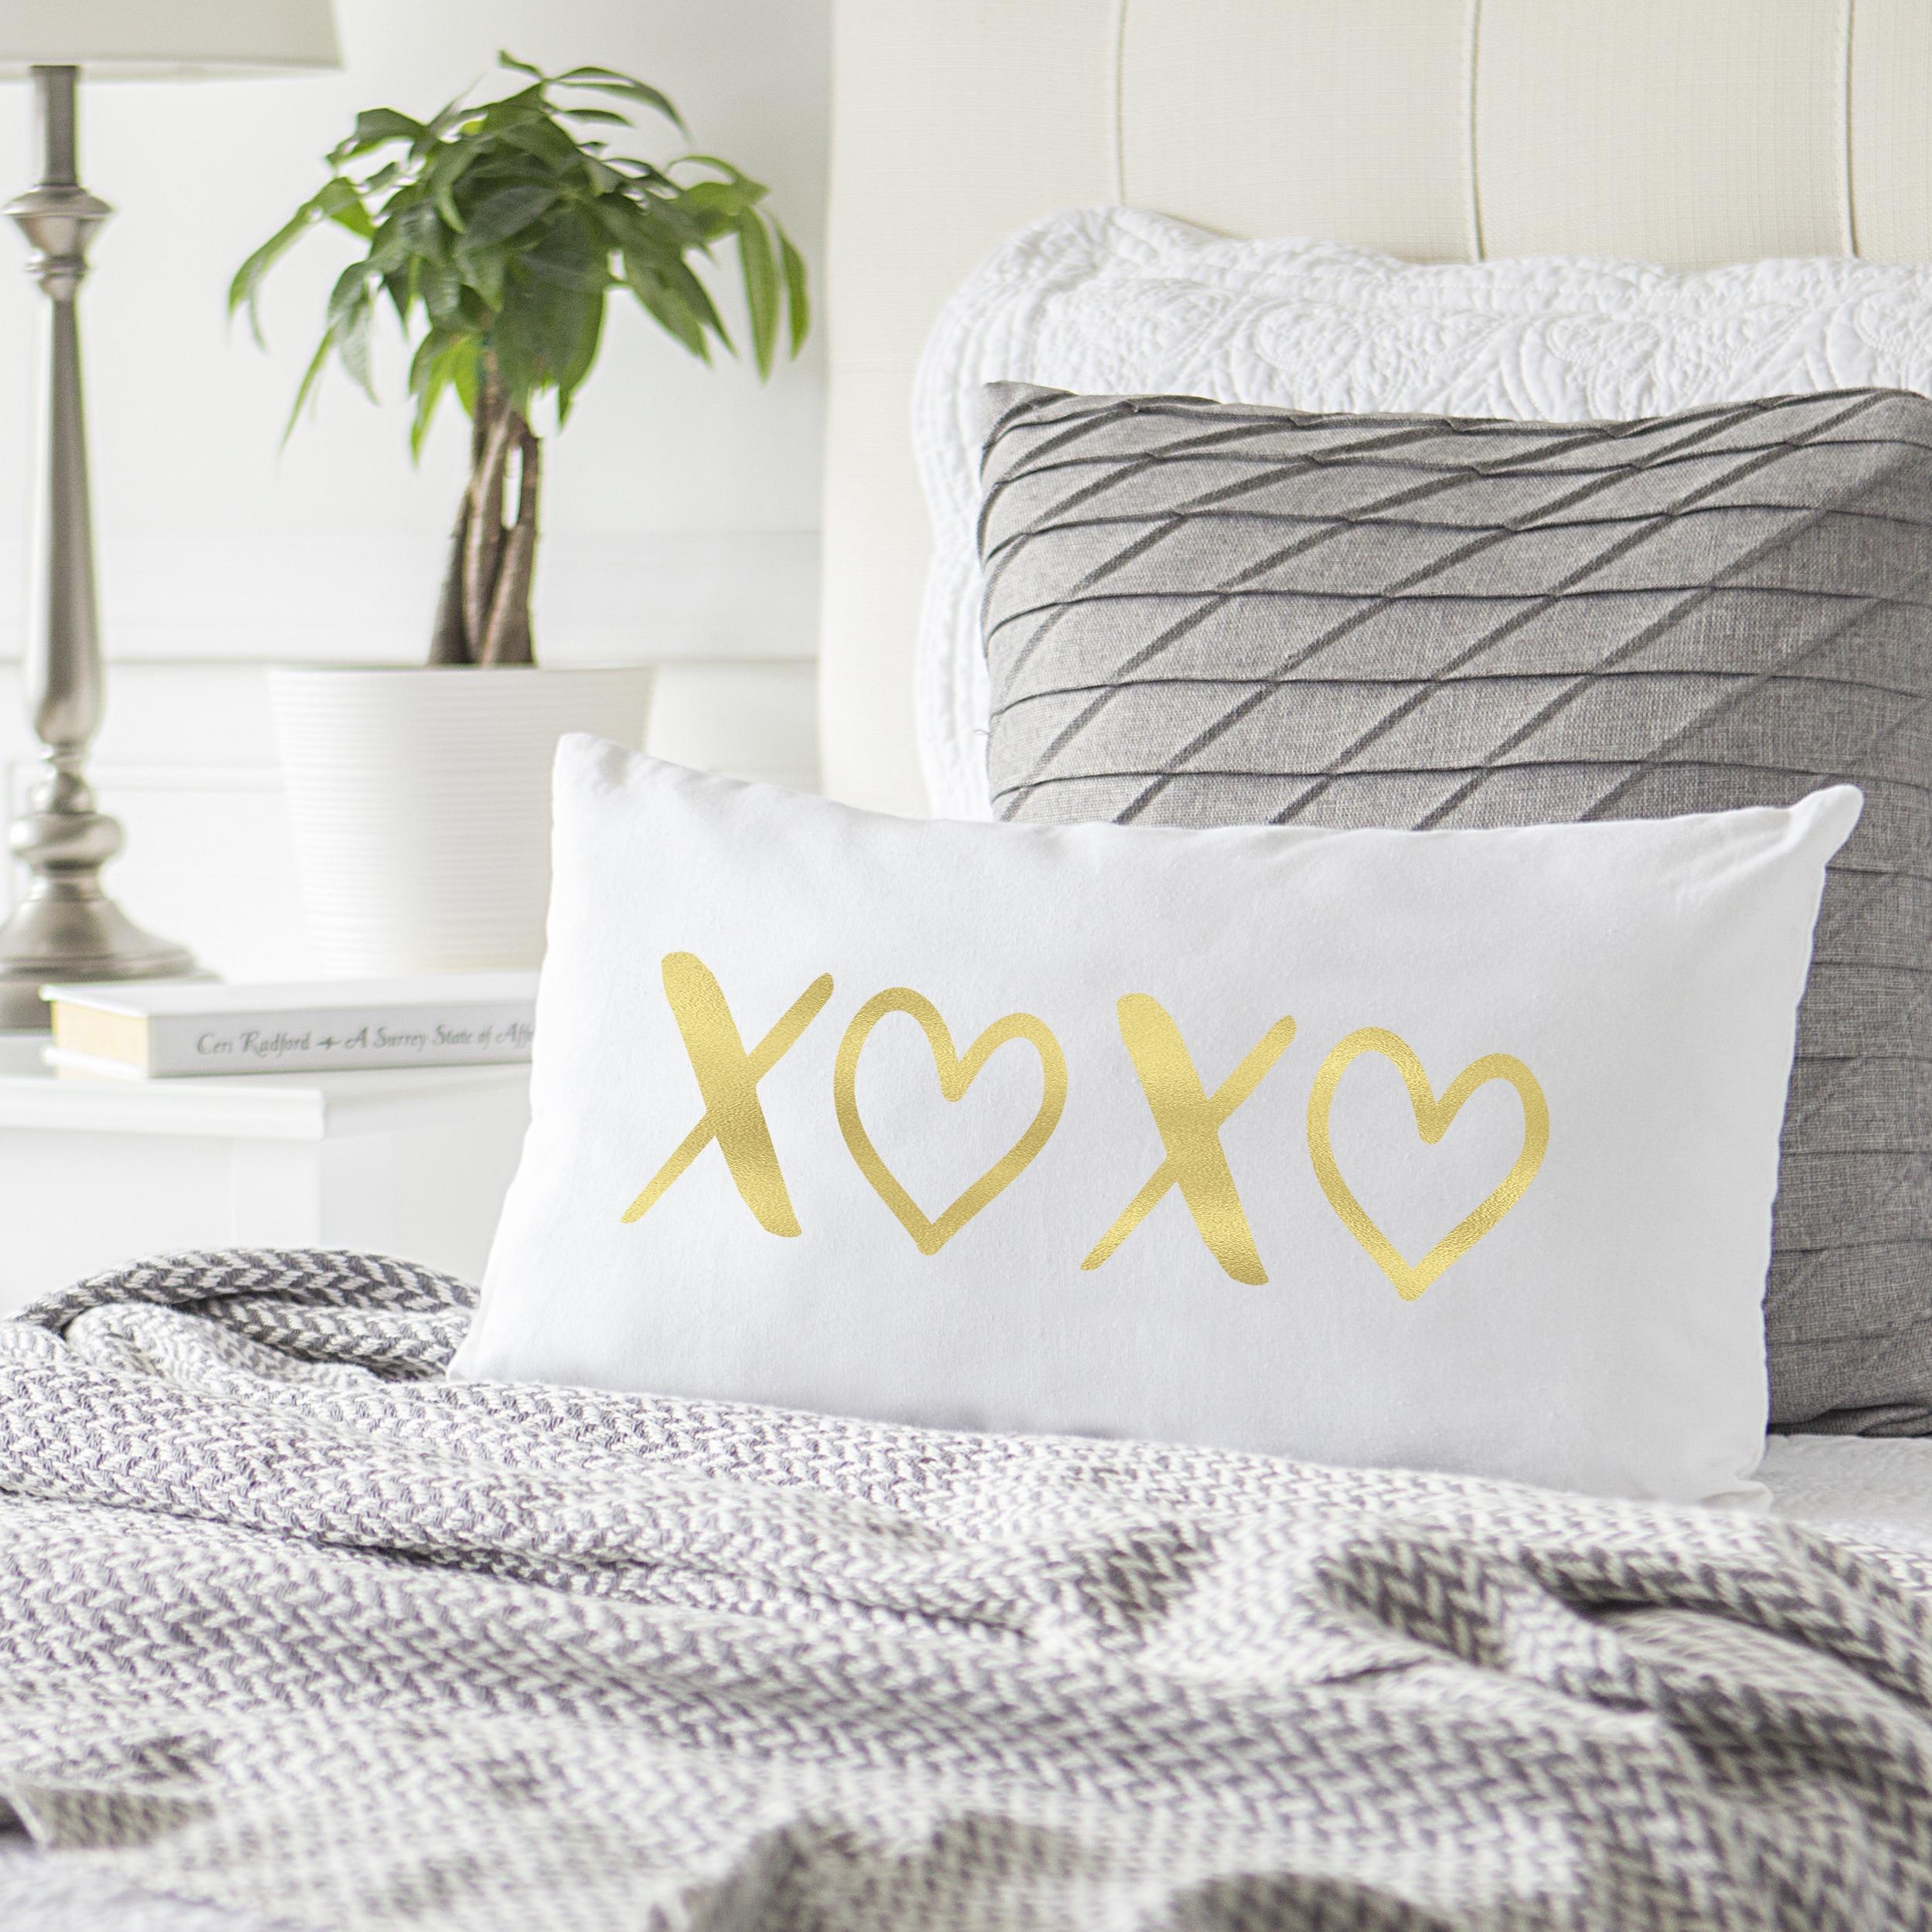 xoxo furniture. Xoxo Furniture. Gold Foil XOXO Lumbar Pillow - Free Shipping On Orders Over $45 Overstock Furniture O